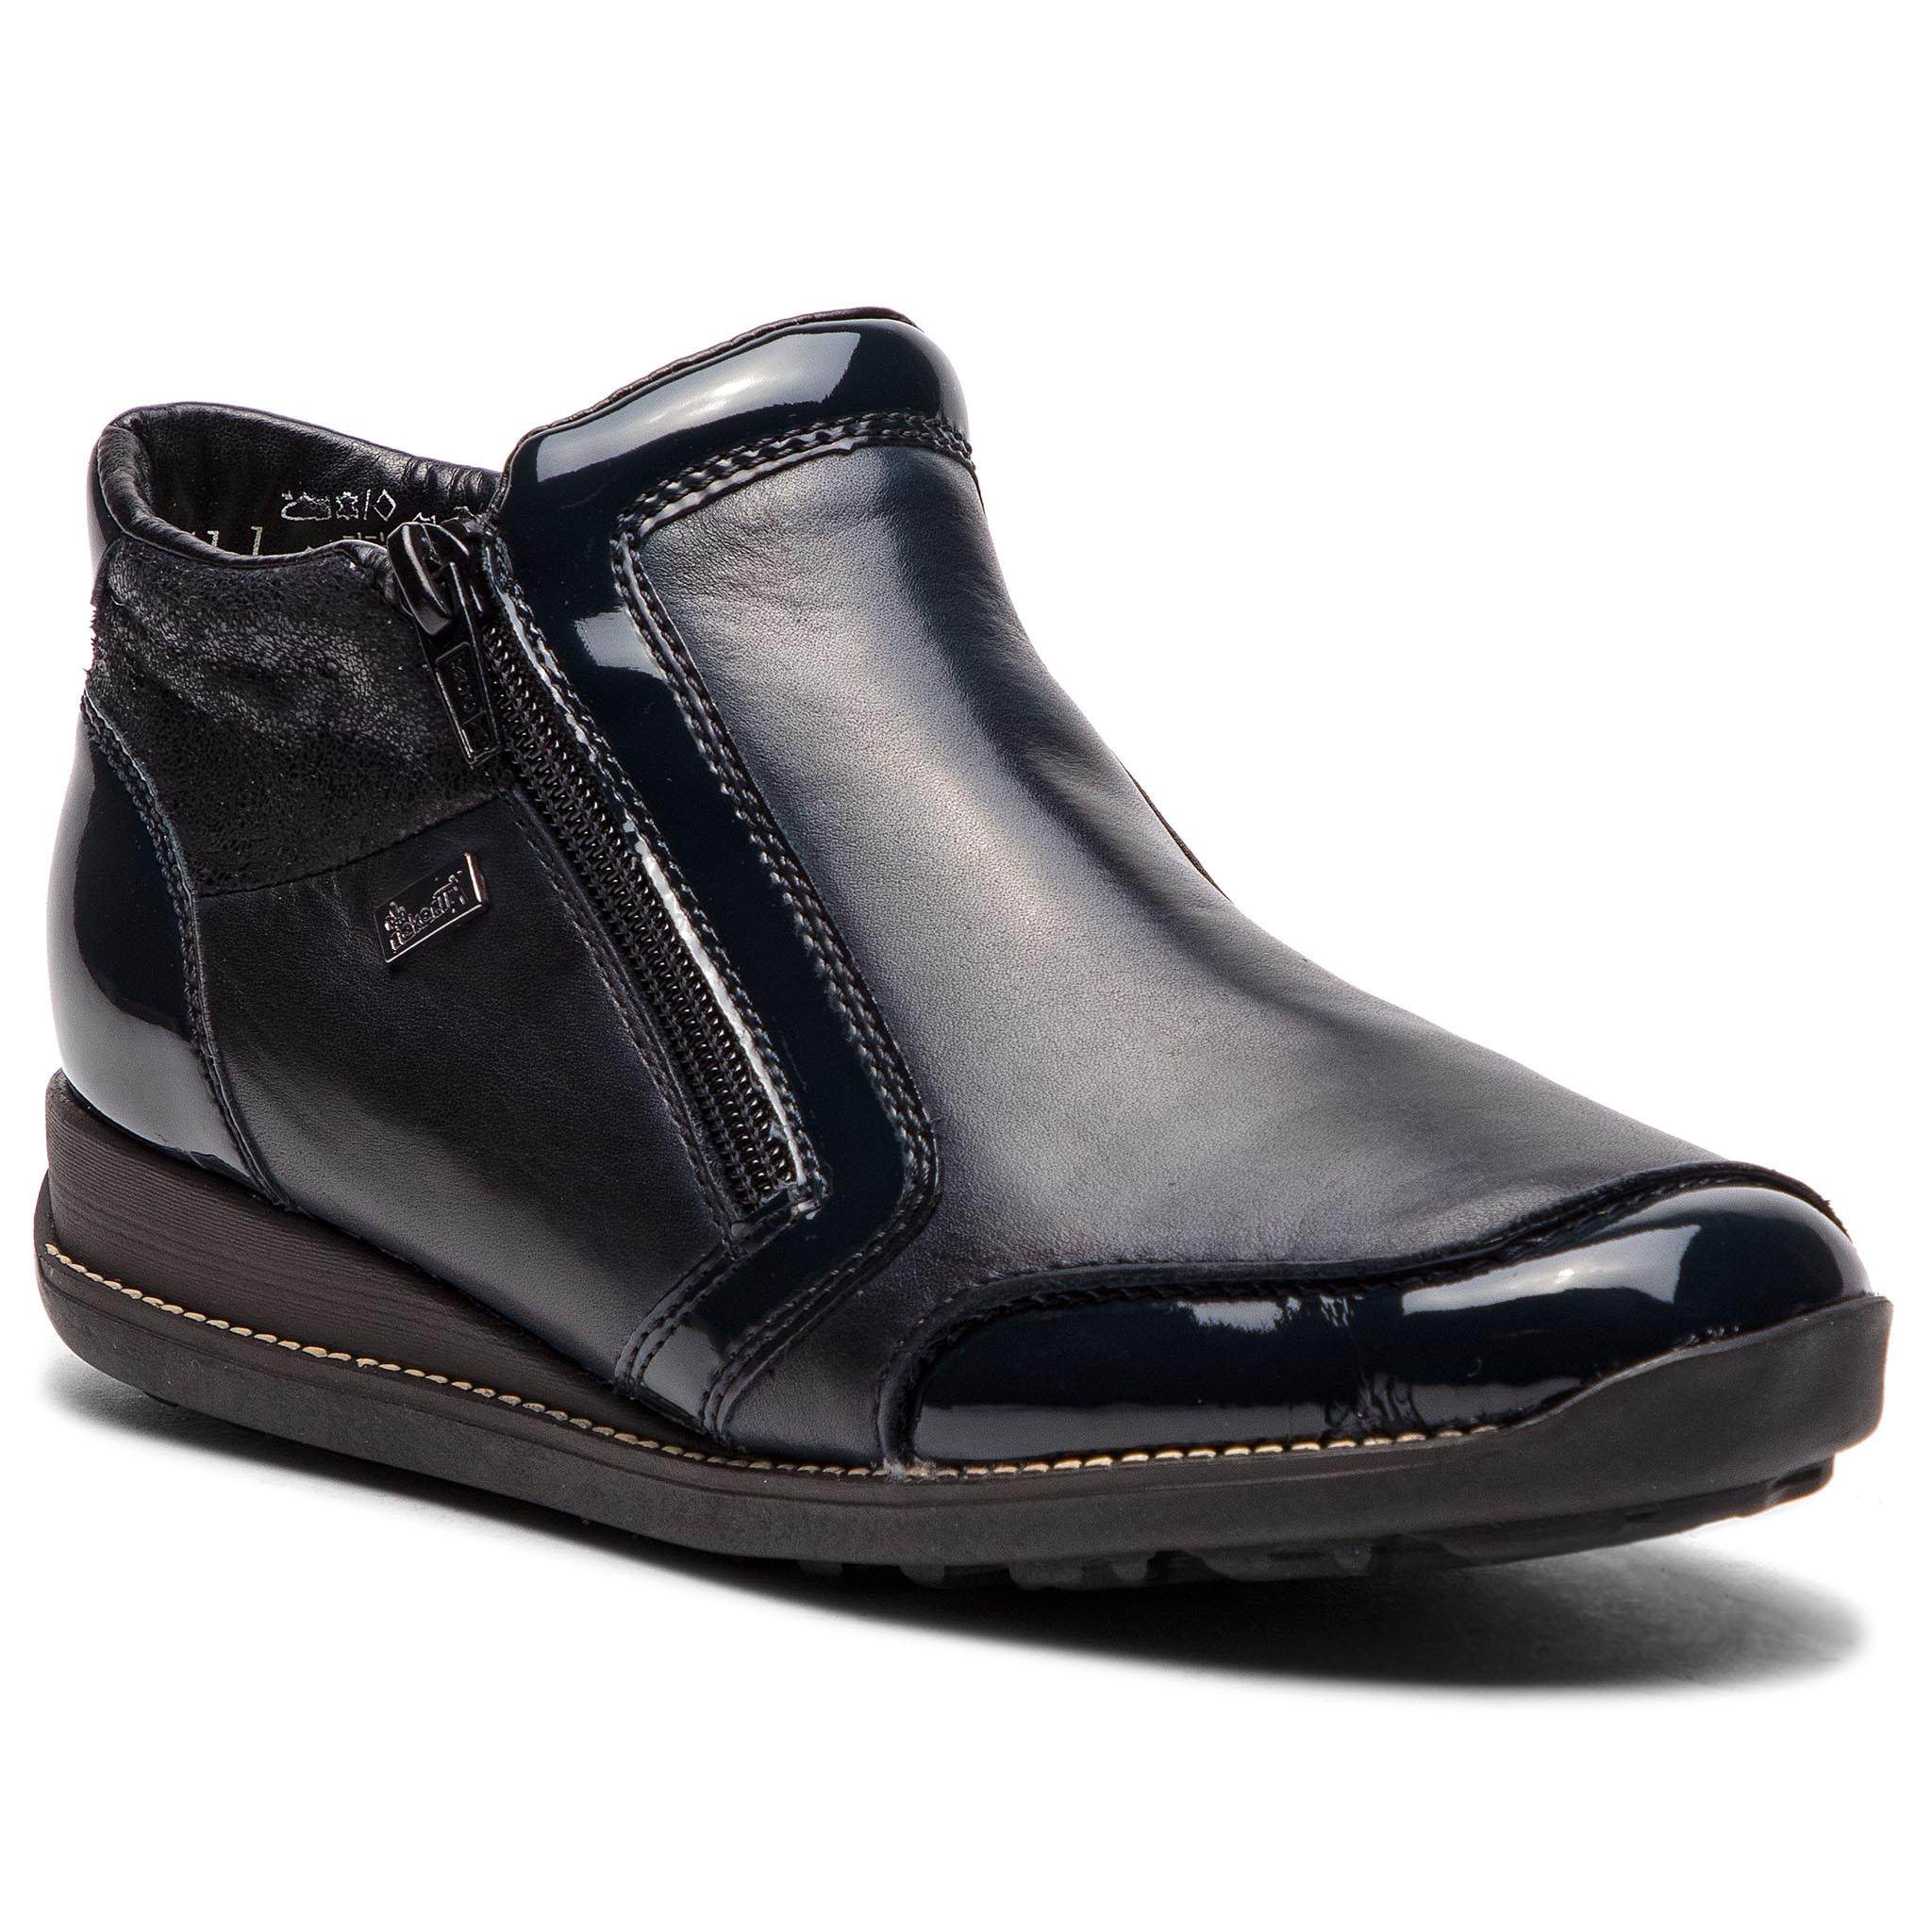 Magasított cipő RIEKER - 44278-14 Navy 1 - Glami.hu ab2ddfddd2